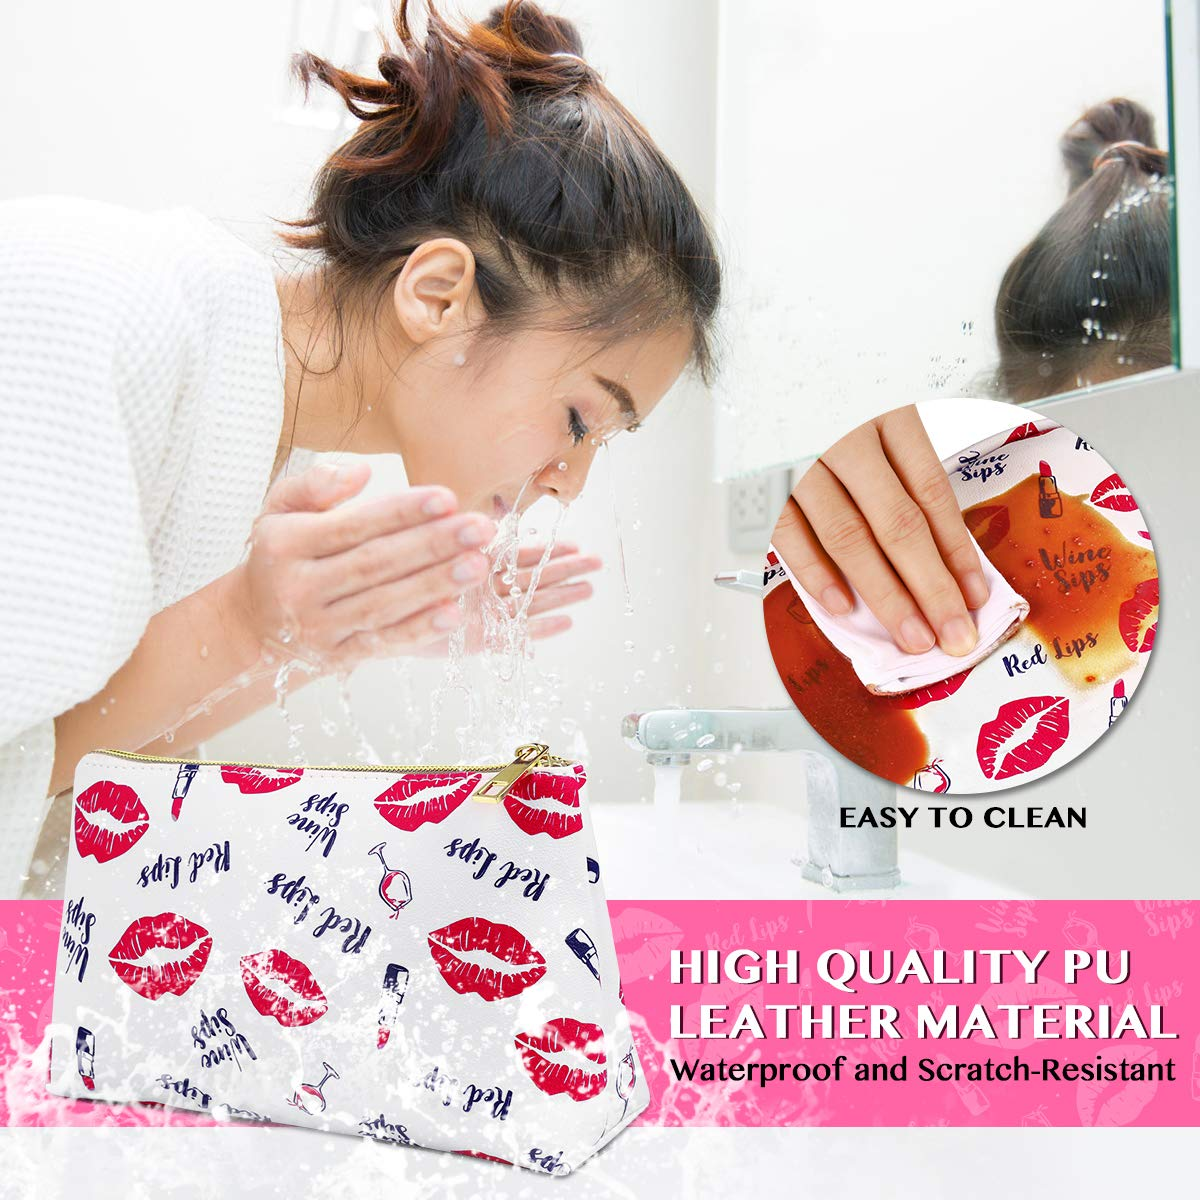 Makeup Bags, Cosmetic Bag 3 Packs Portable Travel Makeup Case Toiletry Bag for Women Girls